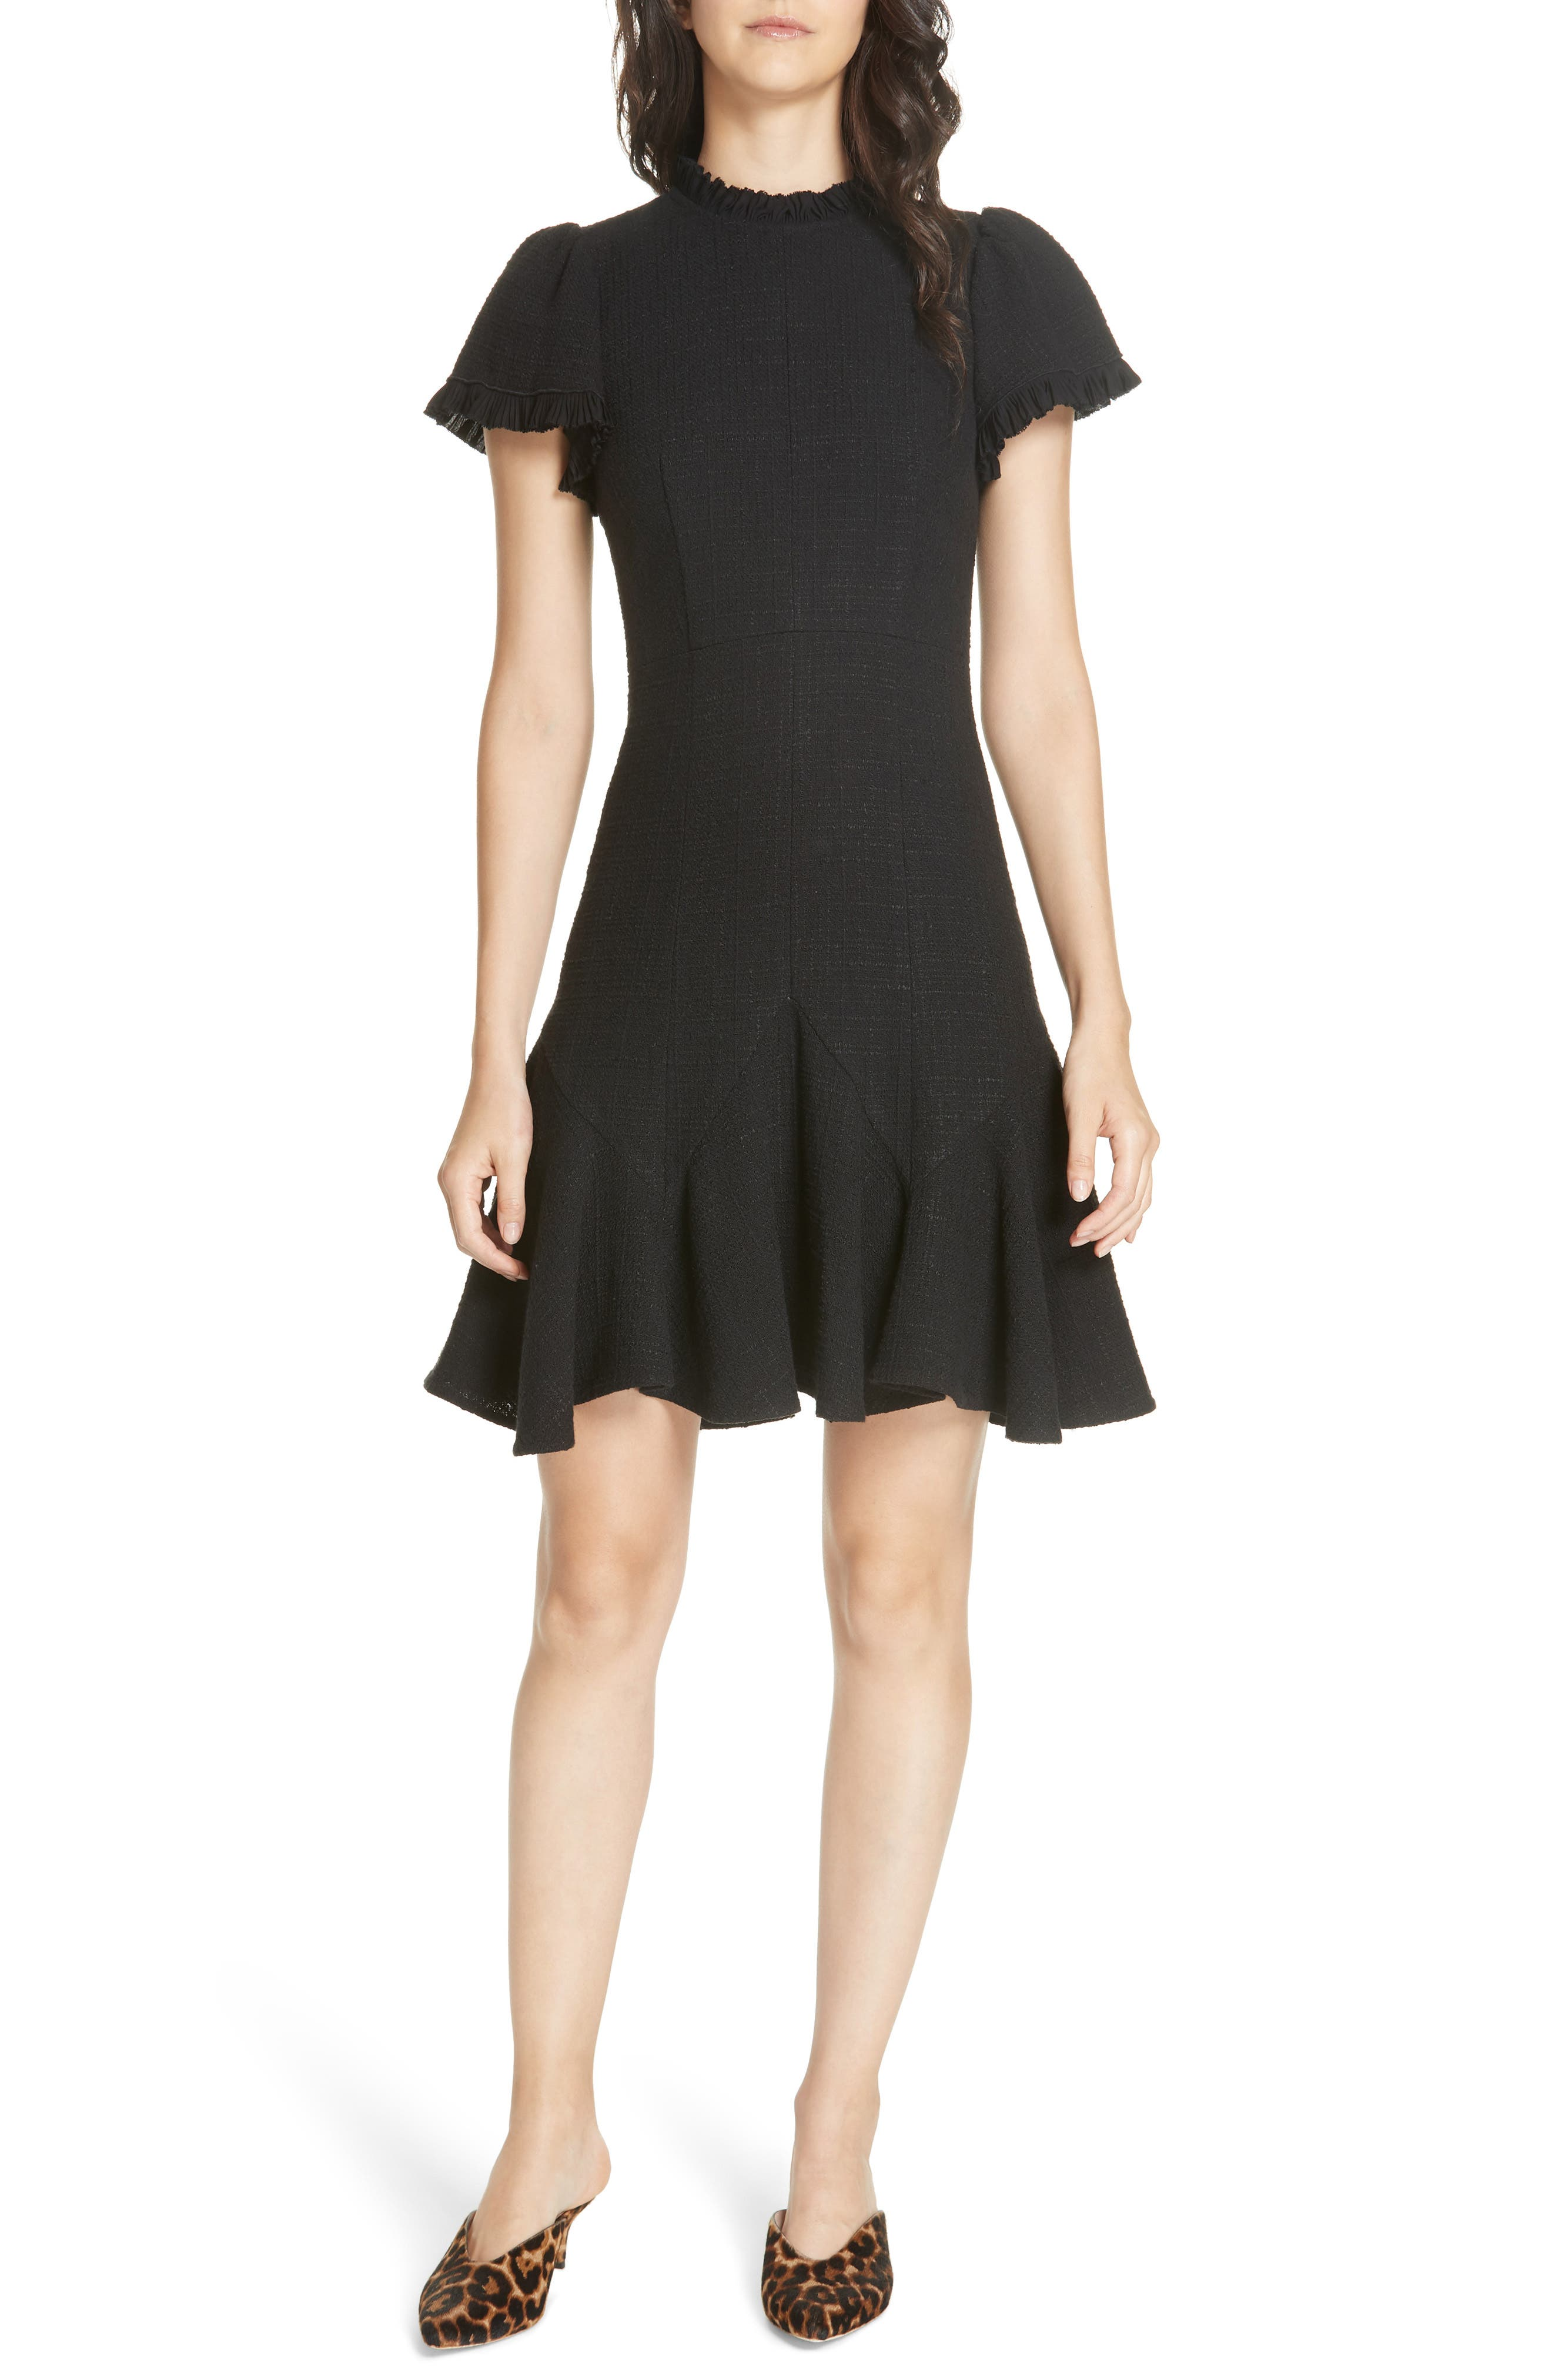 REBECCA TAYLOR Short-Sleeve Ruffle Tweed Short Dress in Black